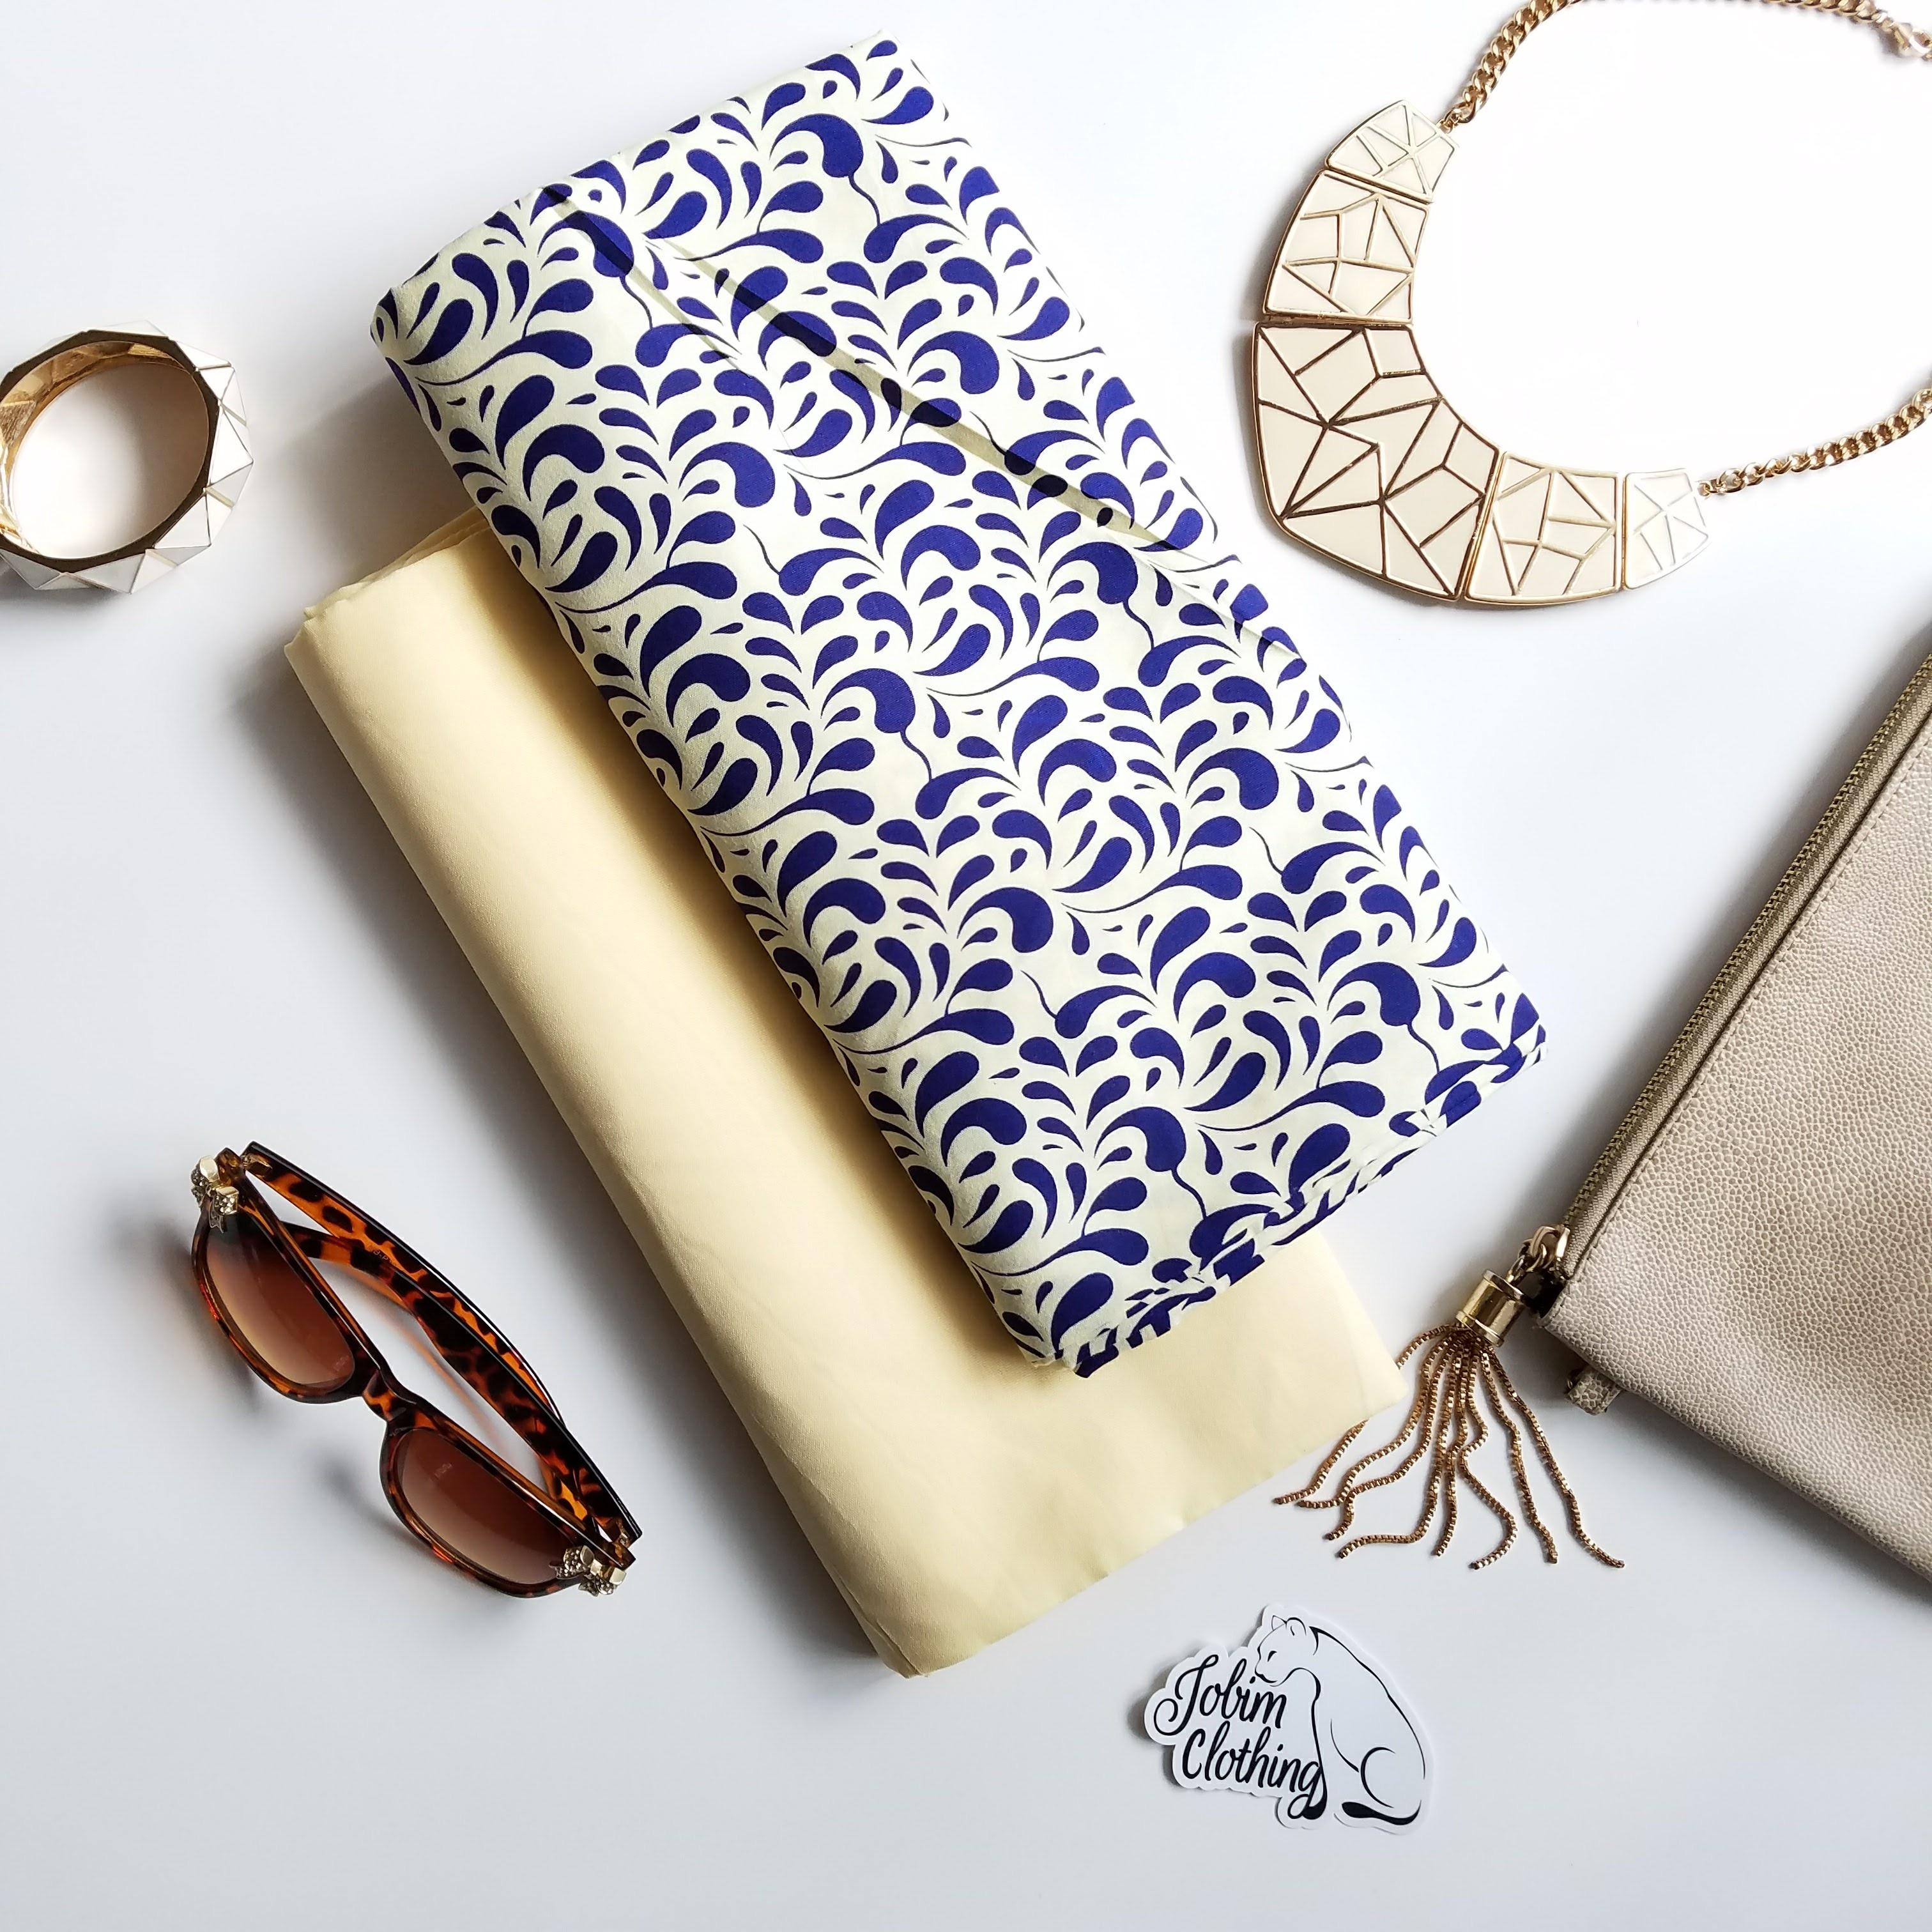 Jobim Clothing Blue and White Ankara Fabric